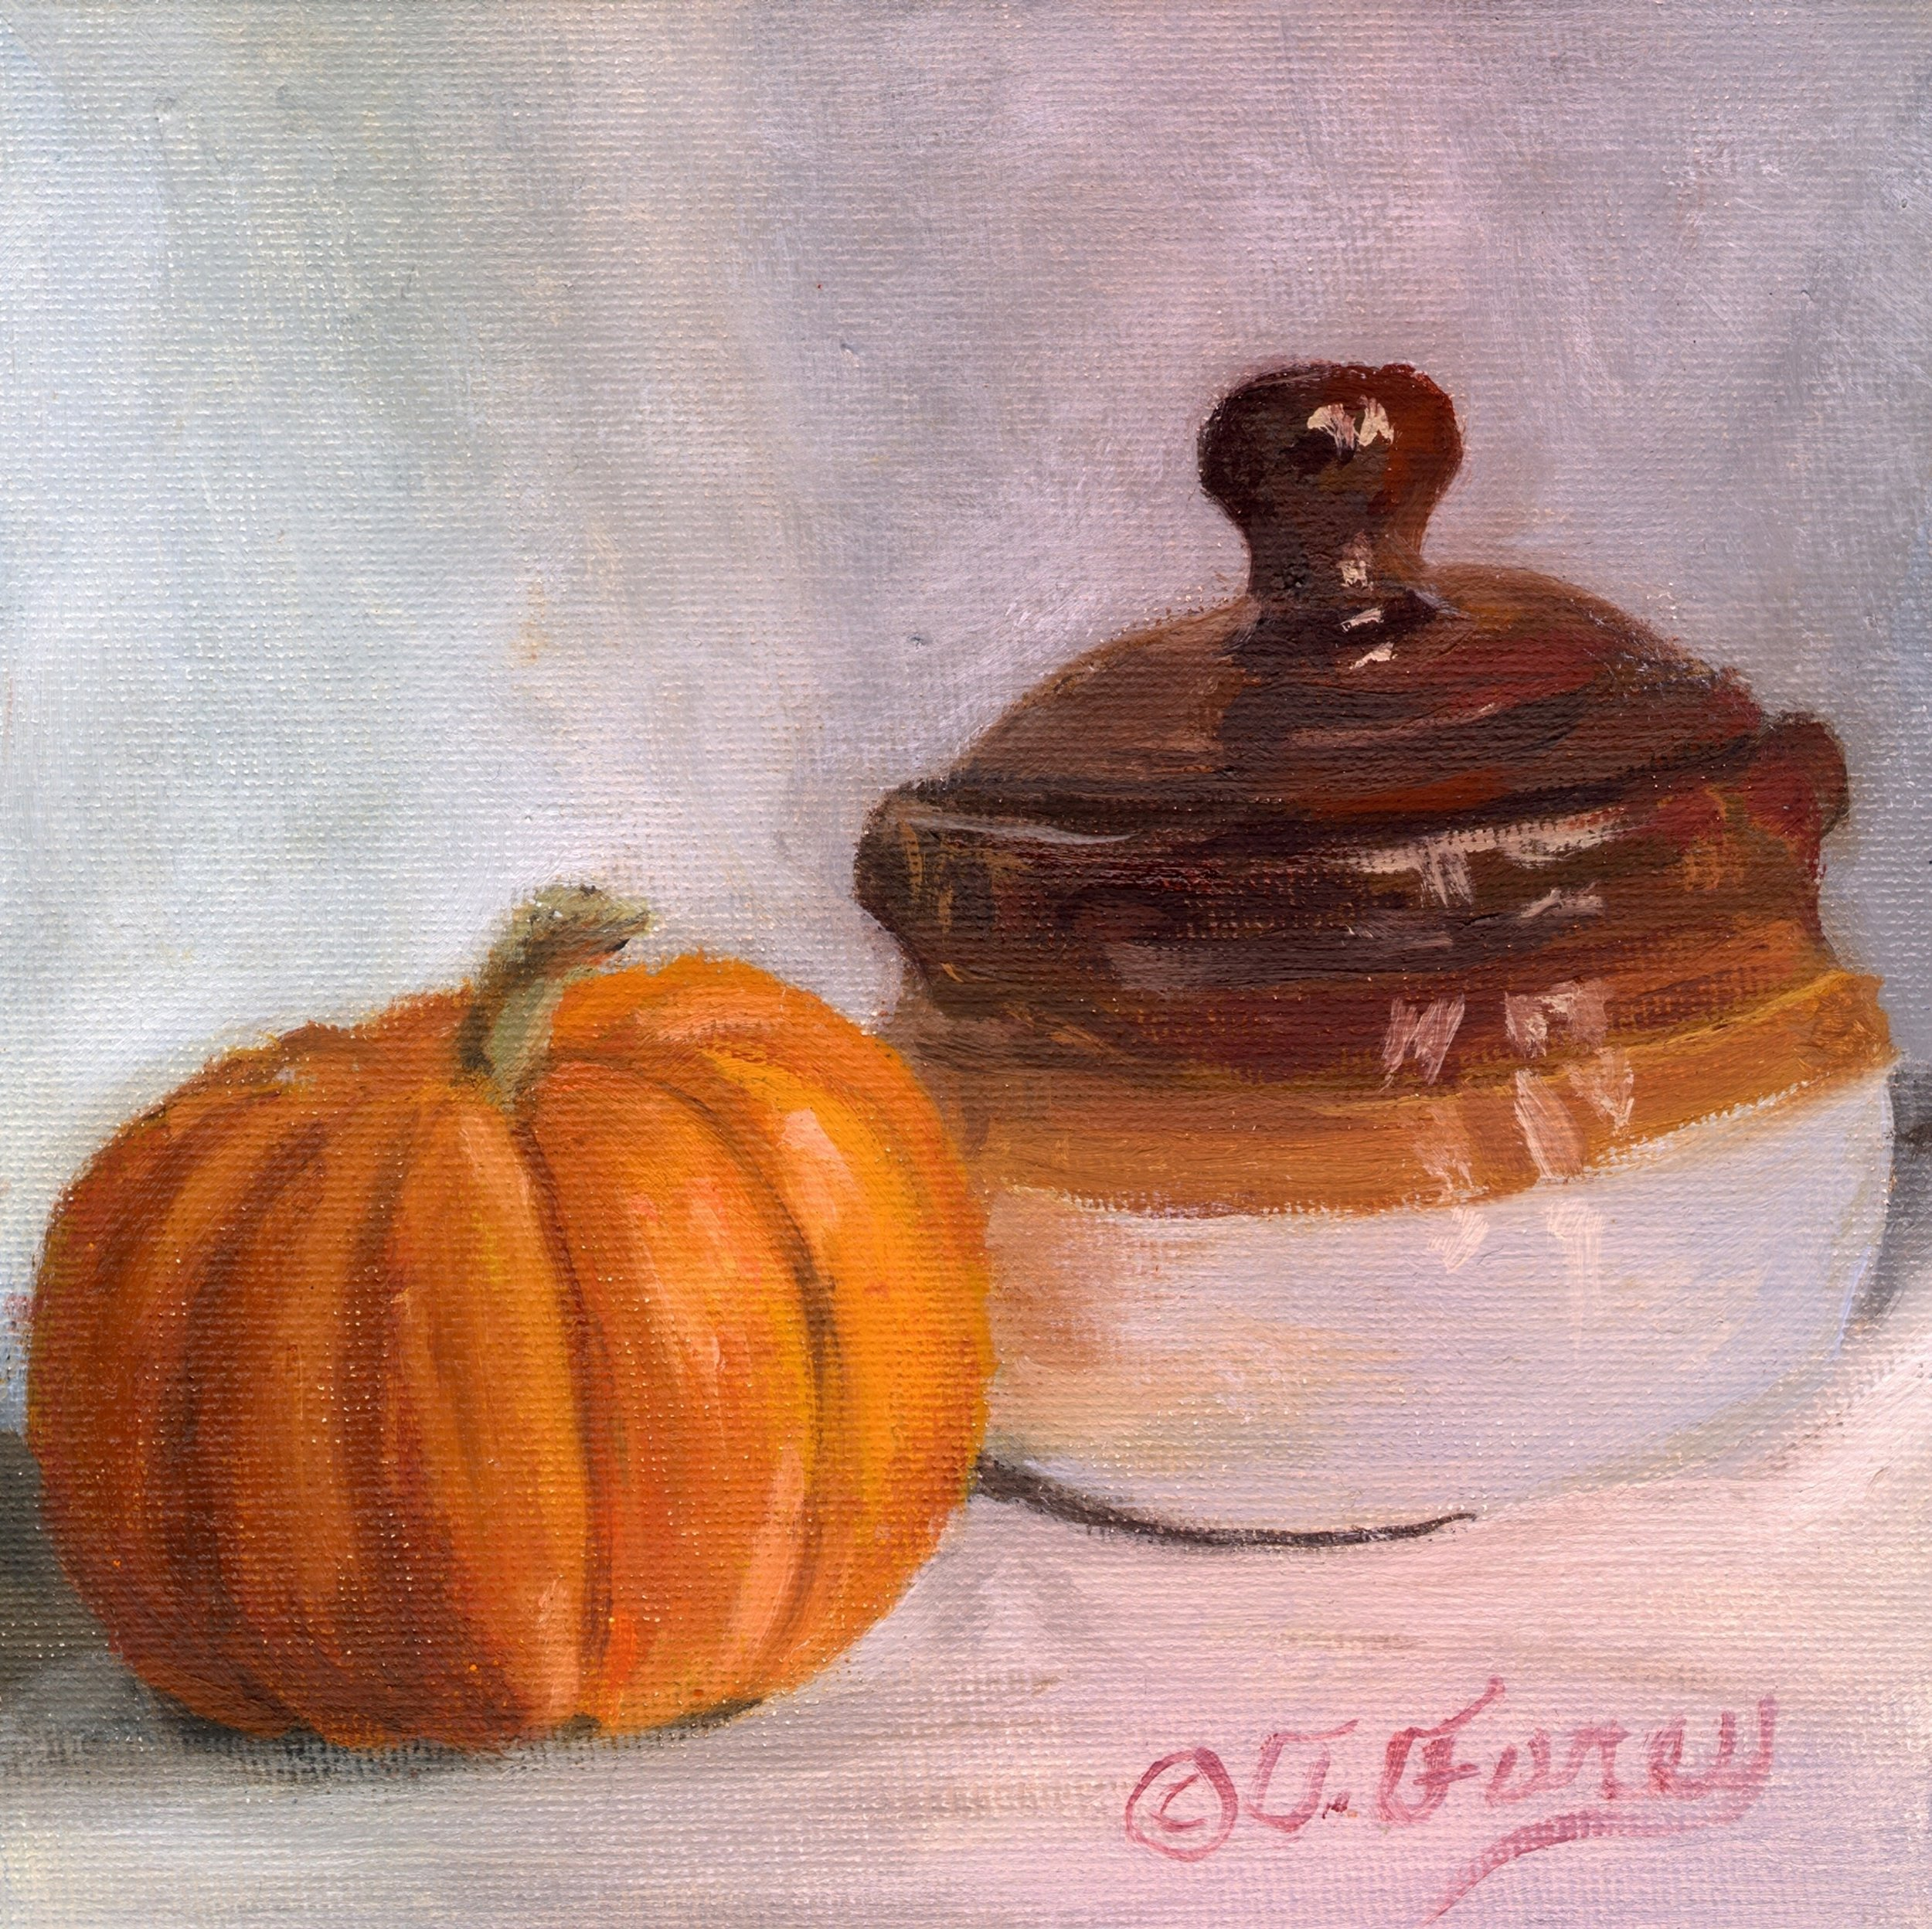 Pumpkin and the Pot